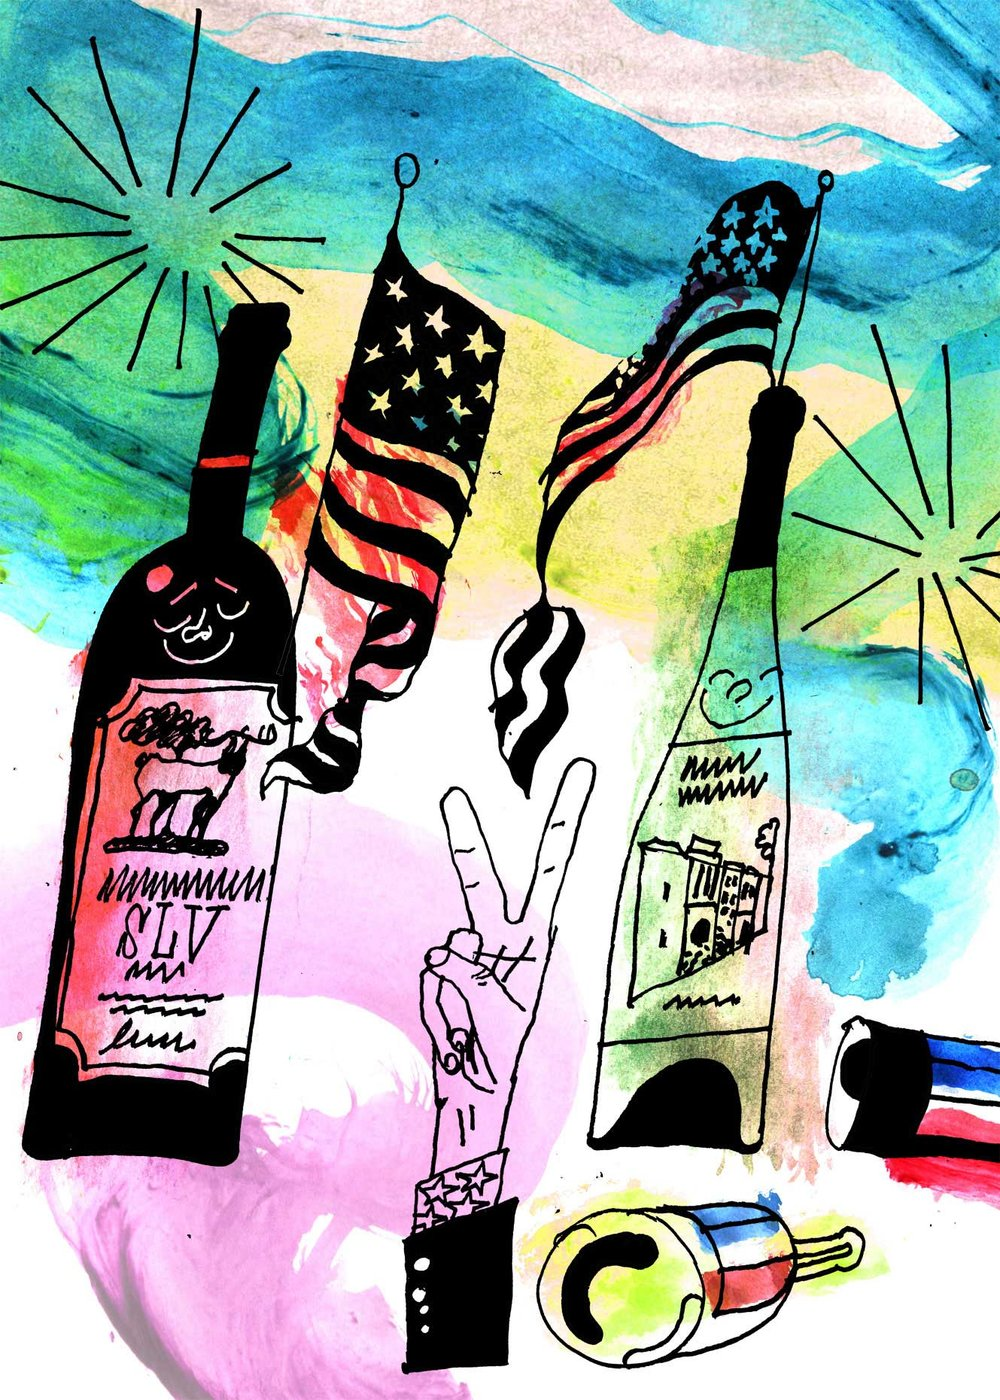 Vintavling.jpg